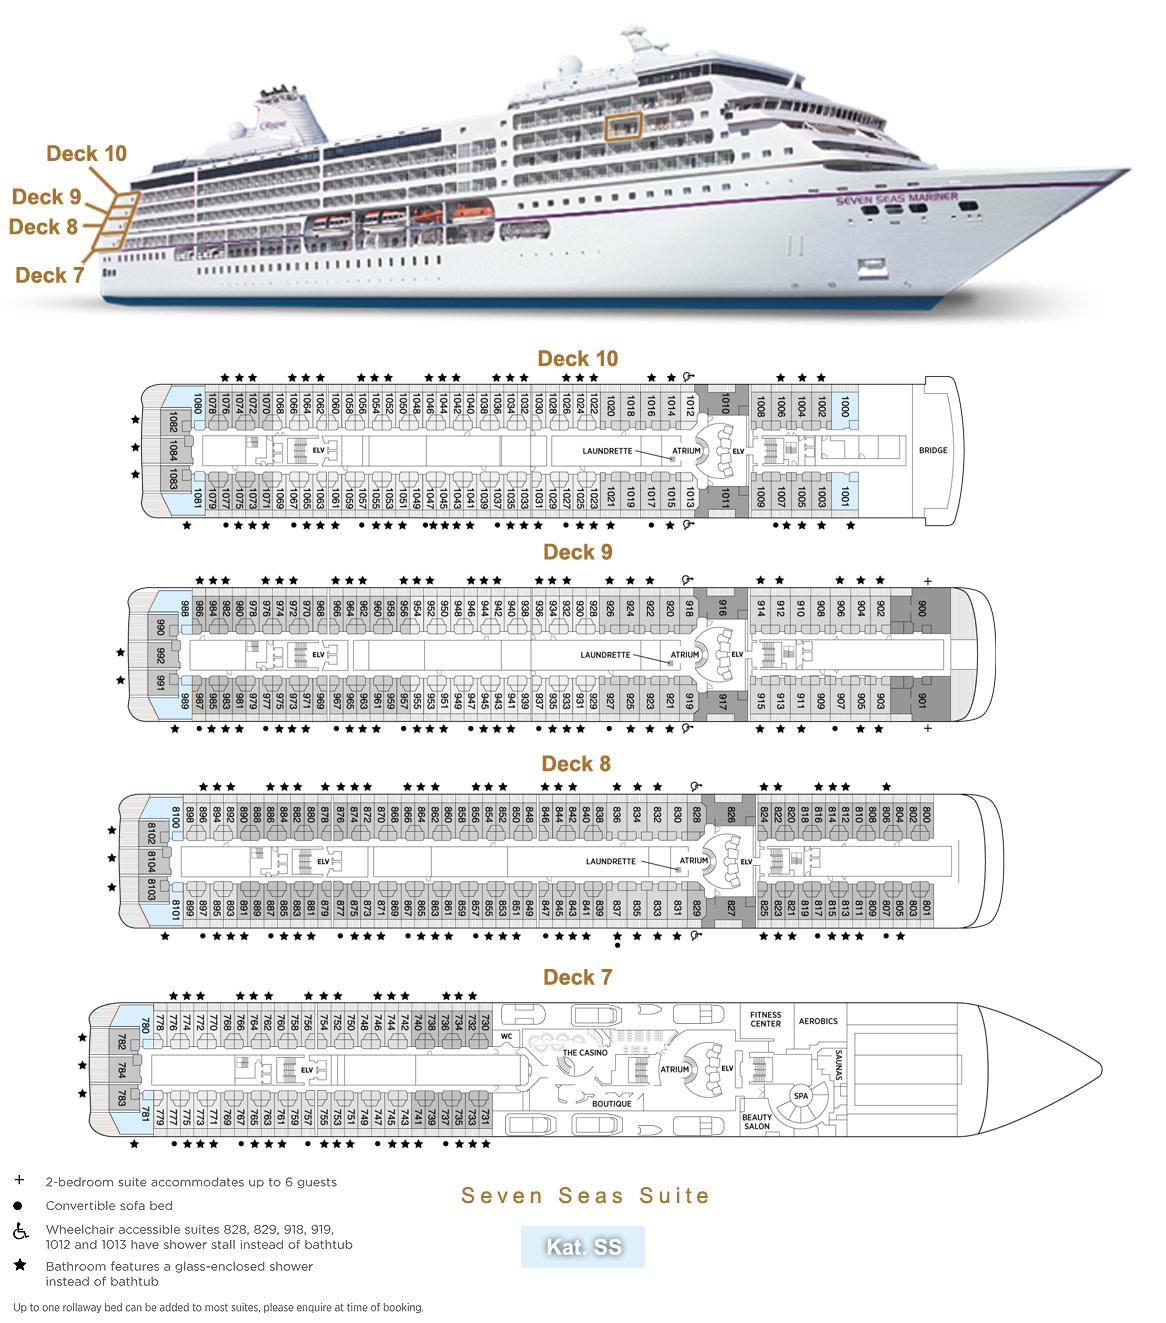 Seven Seas Suite / Bug SS - Seven Seas Mariner - Bild 5 - Lage Thumb